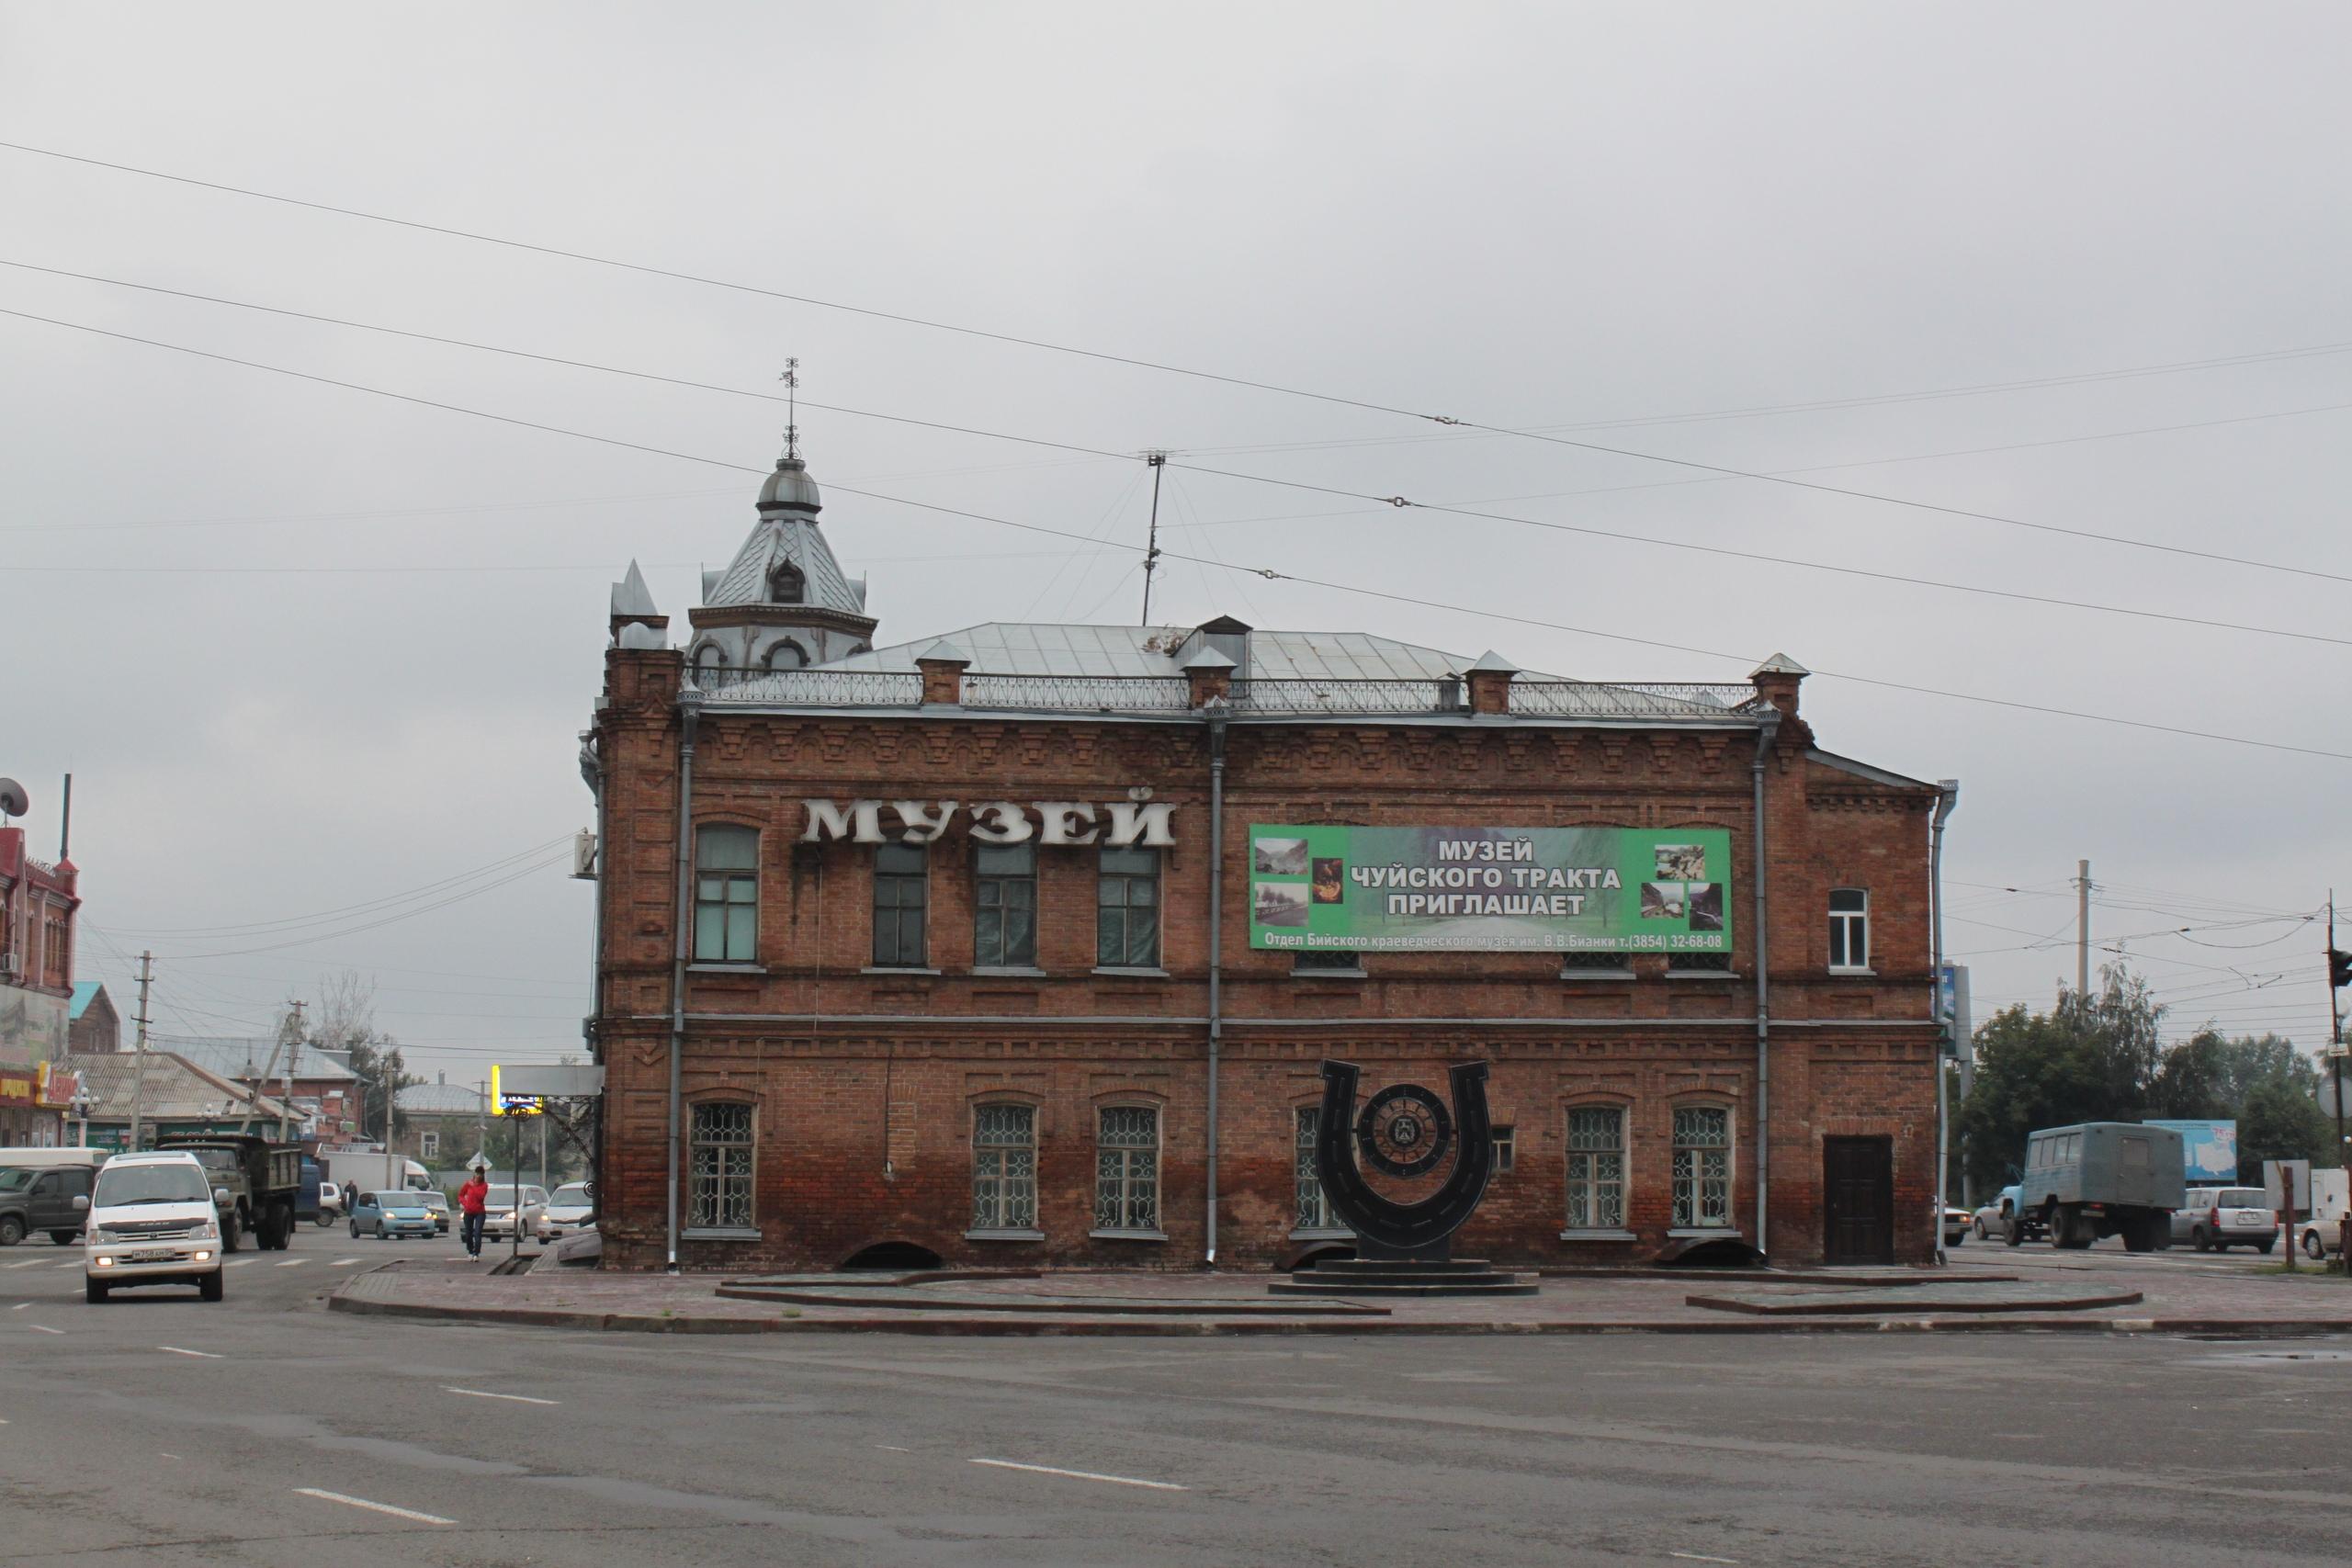 Алтай 2013 (фоторепортаж, 66 фотографий)